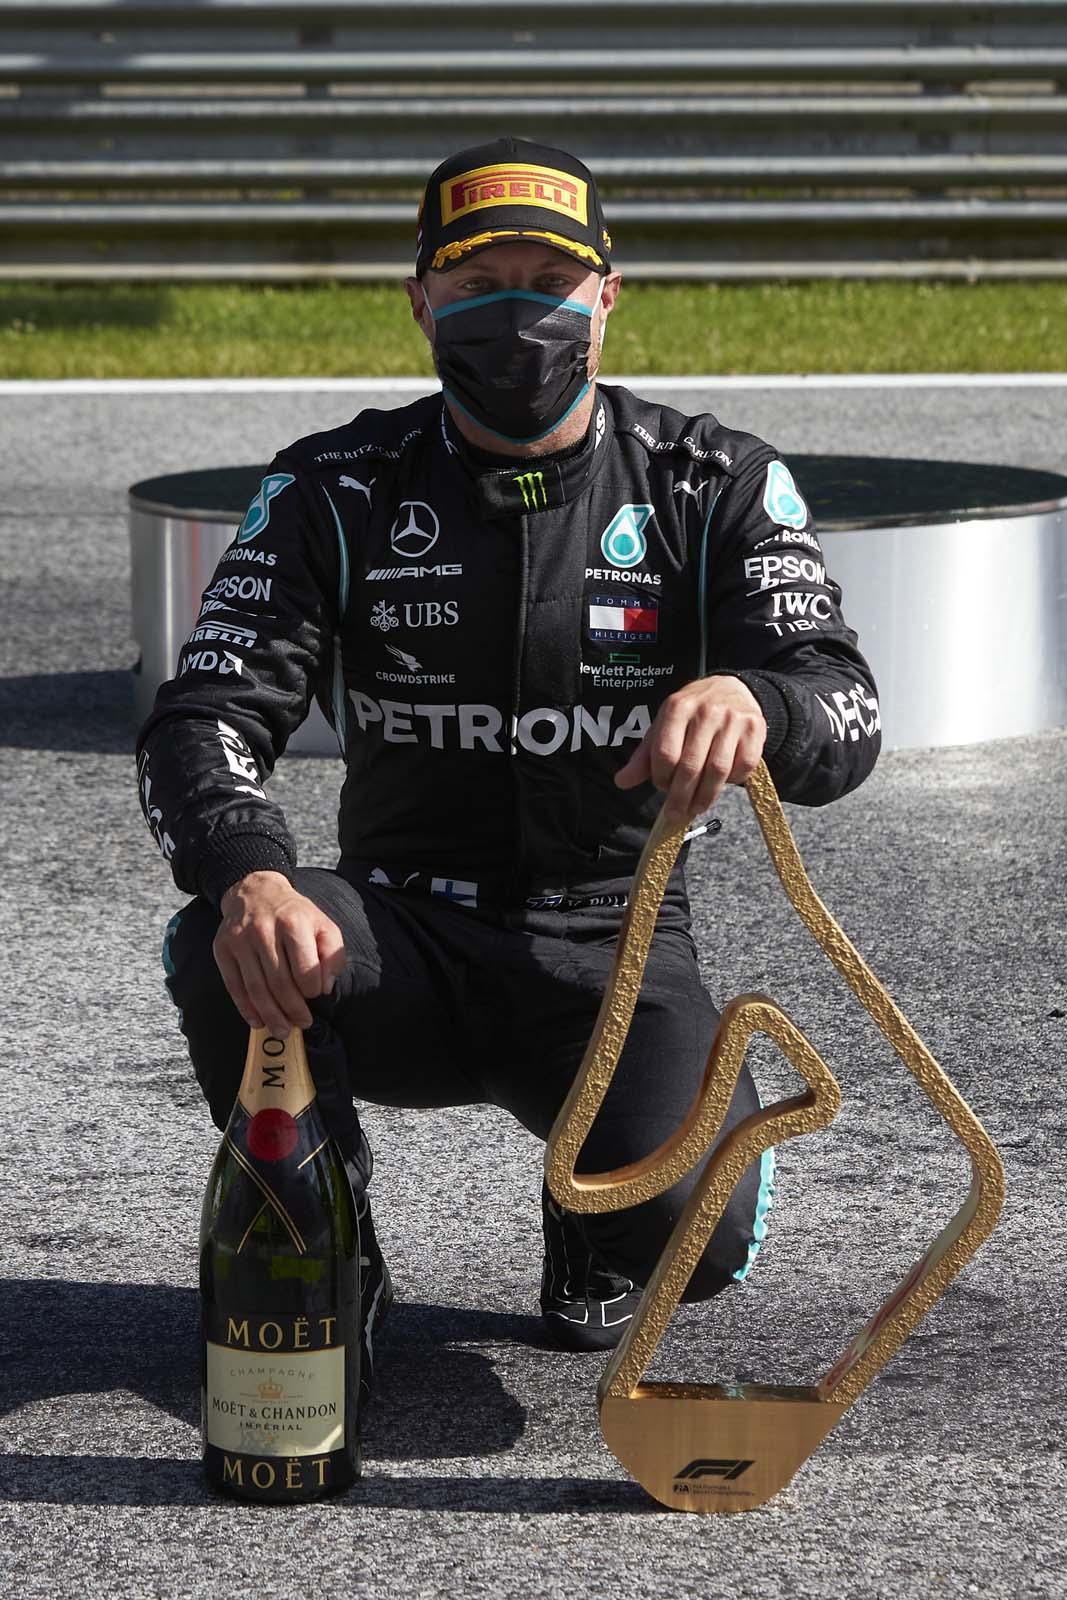 2020 Austrian Grand Prix, Sunday - Steve Etherington